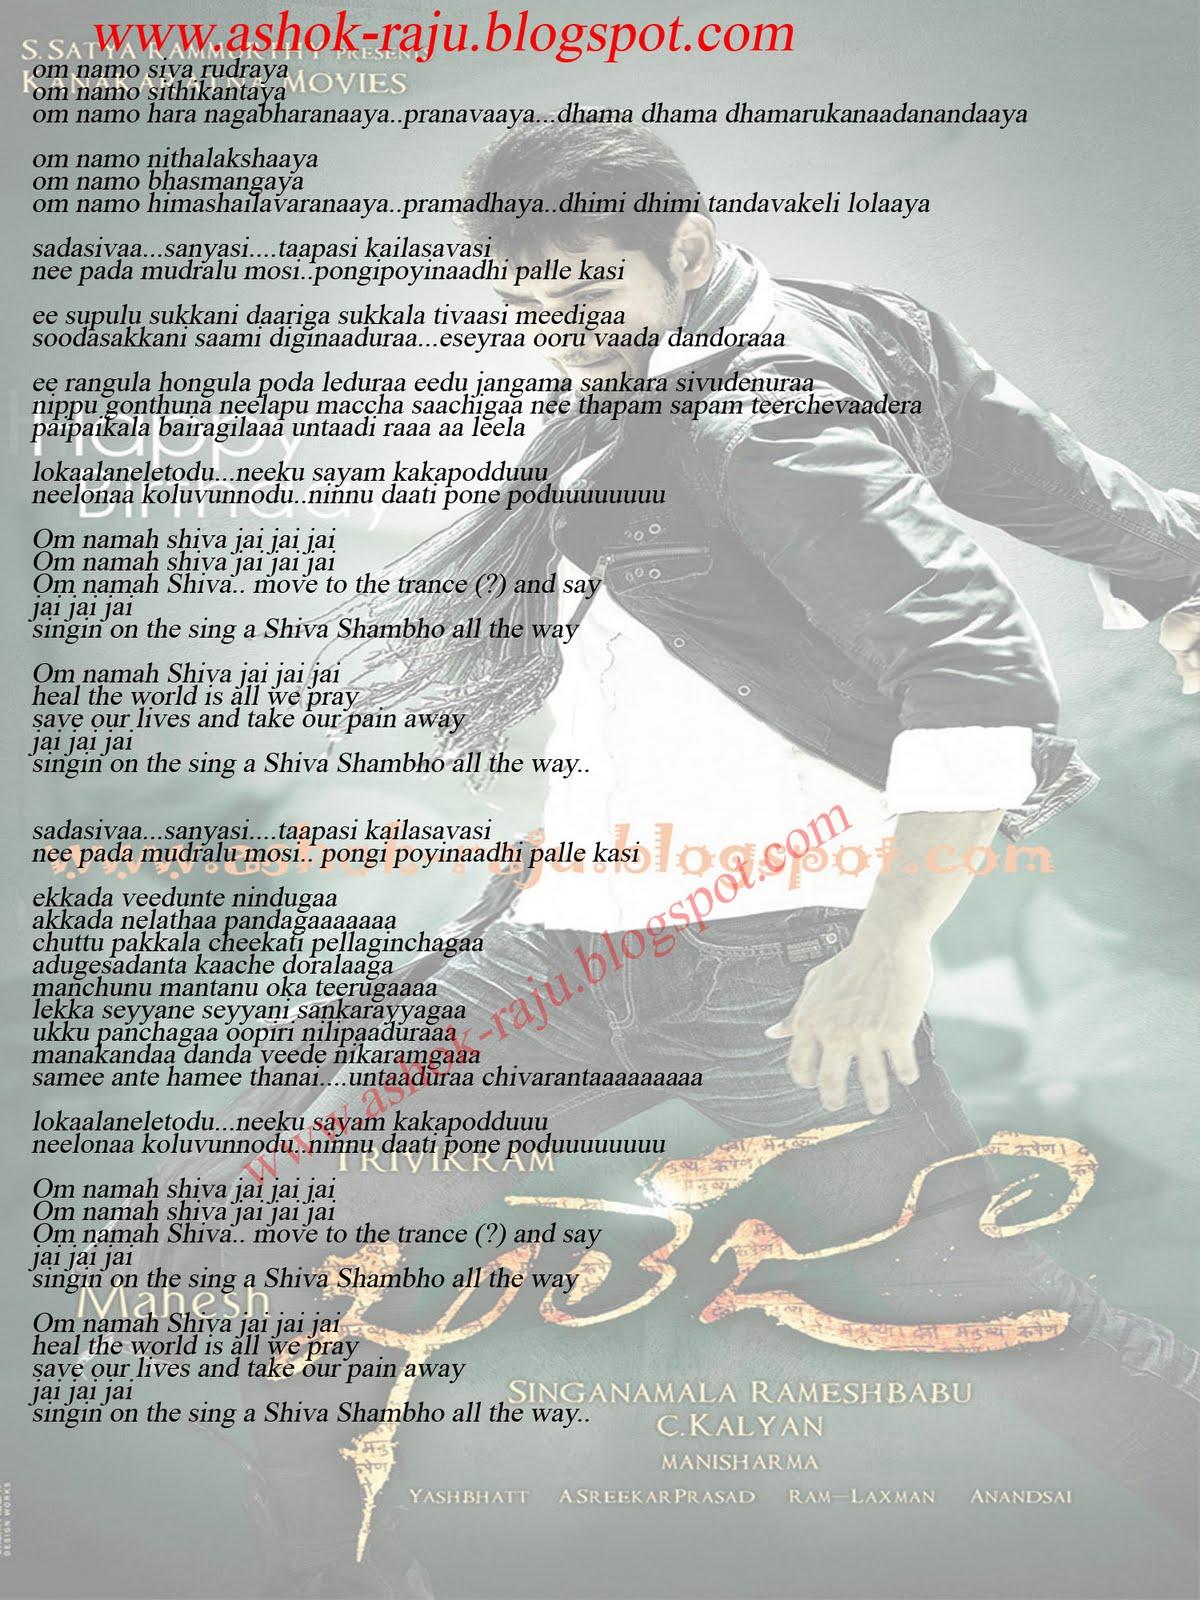 song lyrics wallpaper wallpapersafari